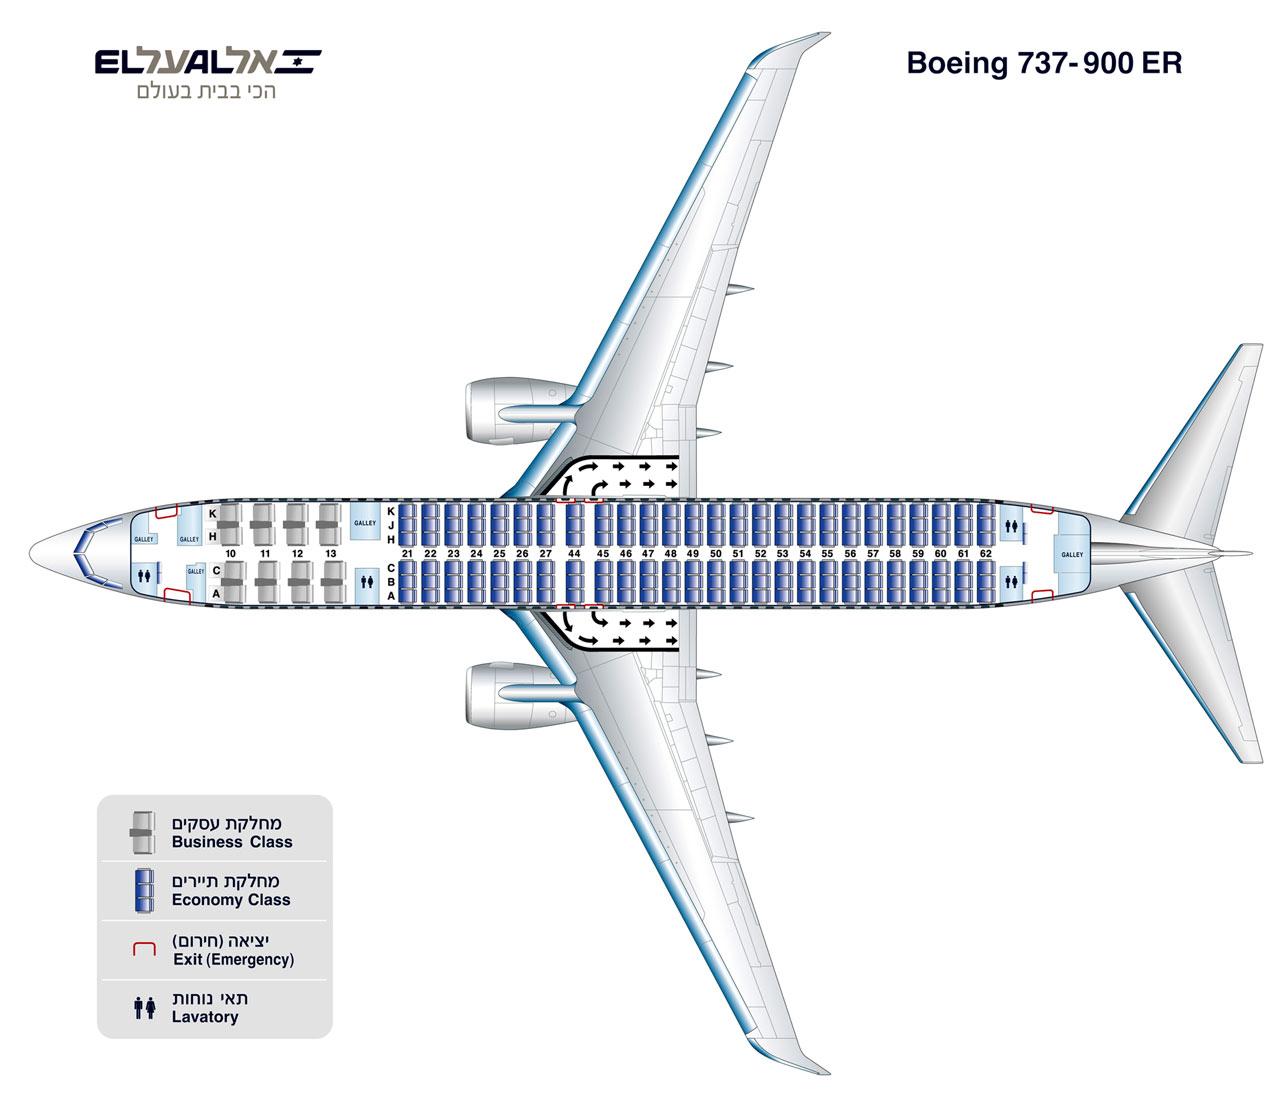 Компоновка салона самолета Боинг-737-900 авиакомпании El Al